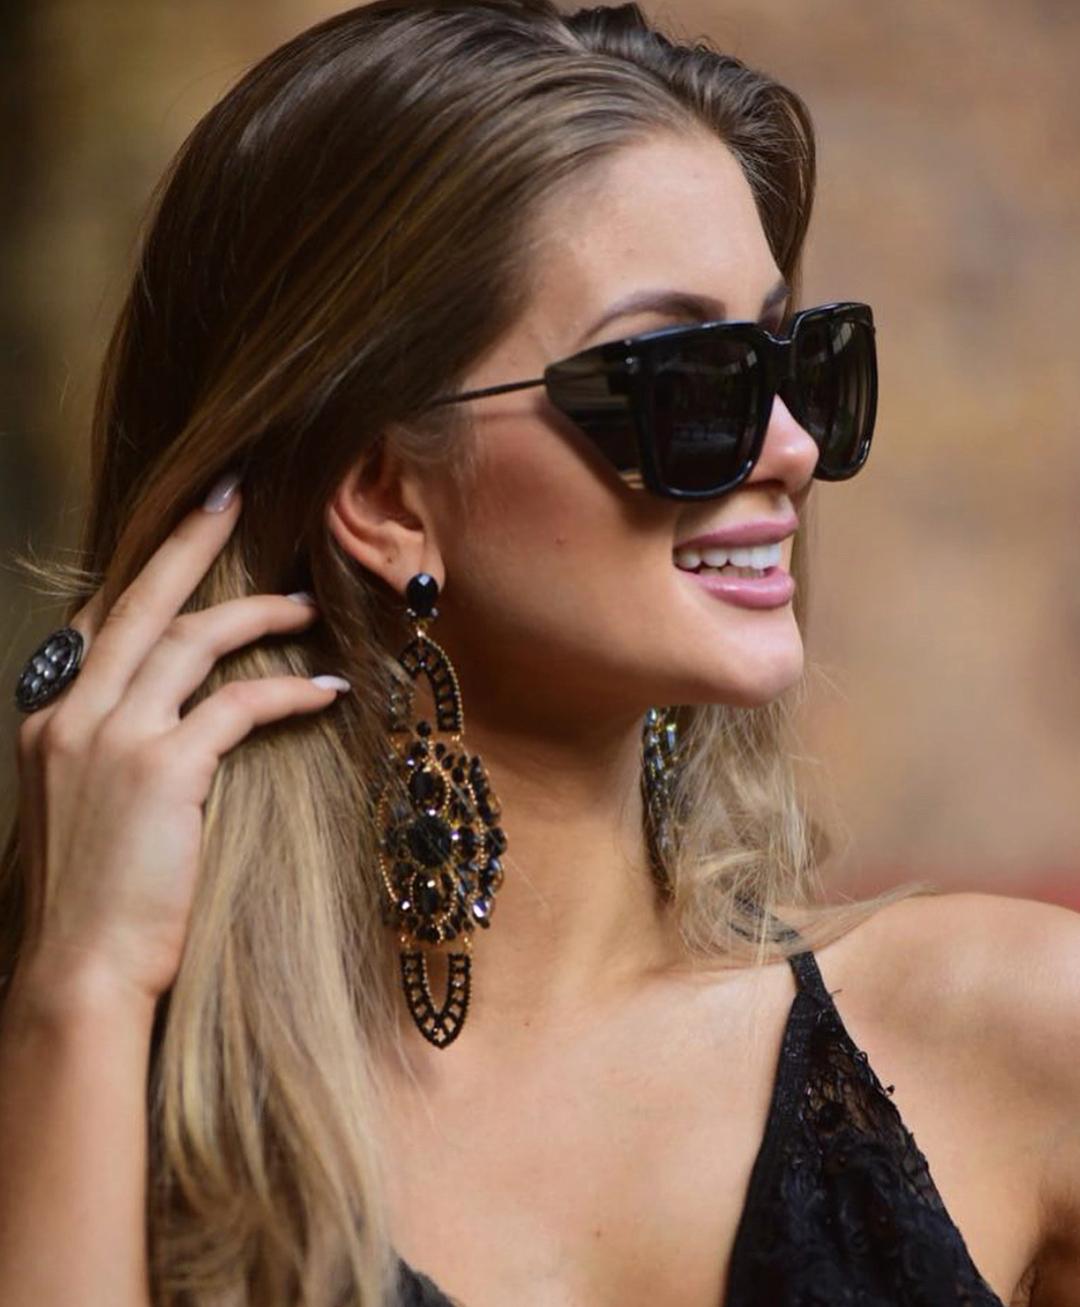 gabriela palma, miss brasil empresarial 2018. - Página 3 37856810